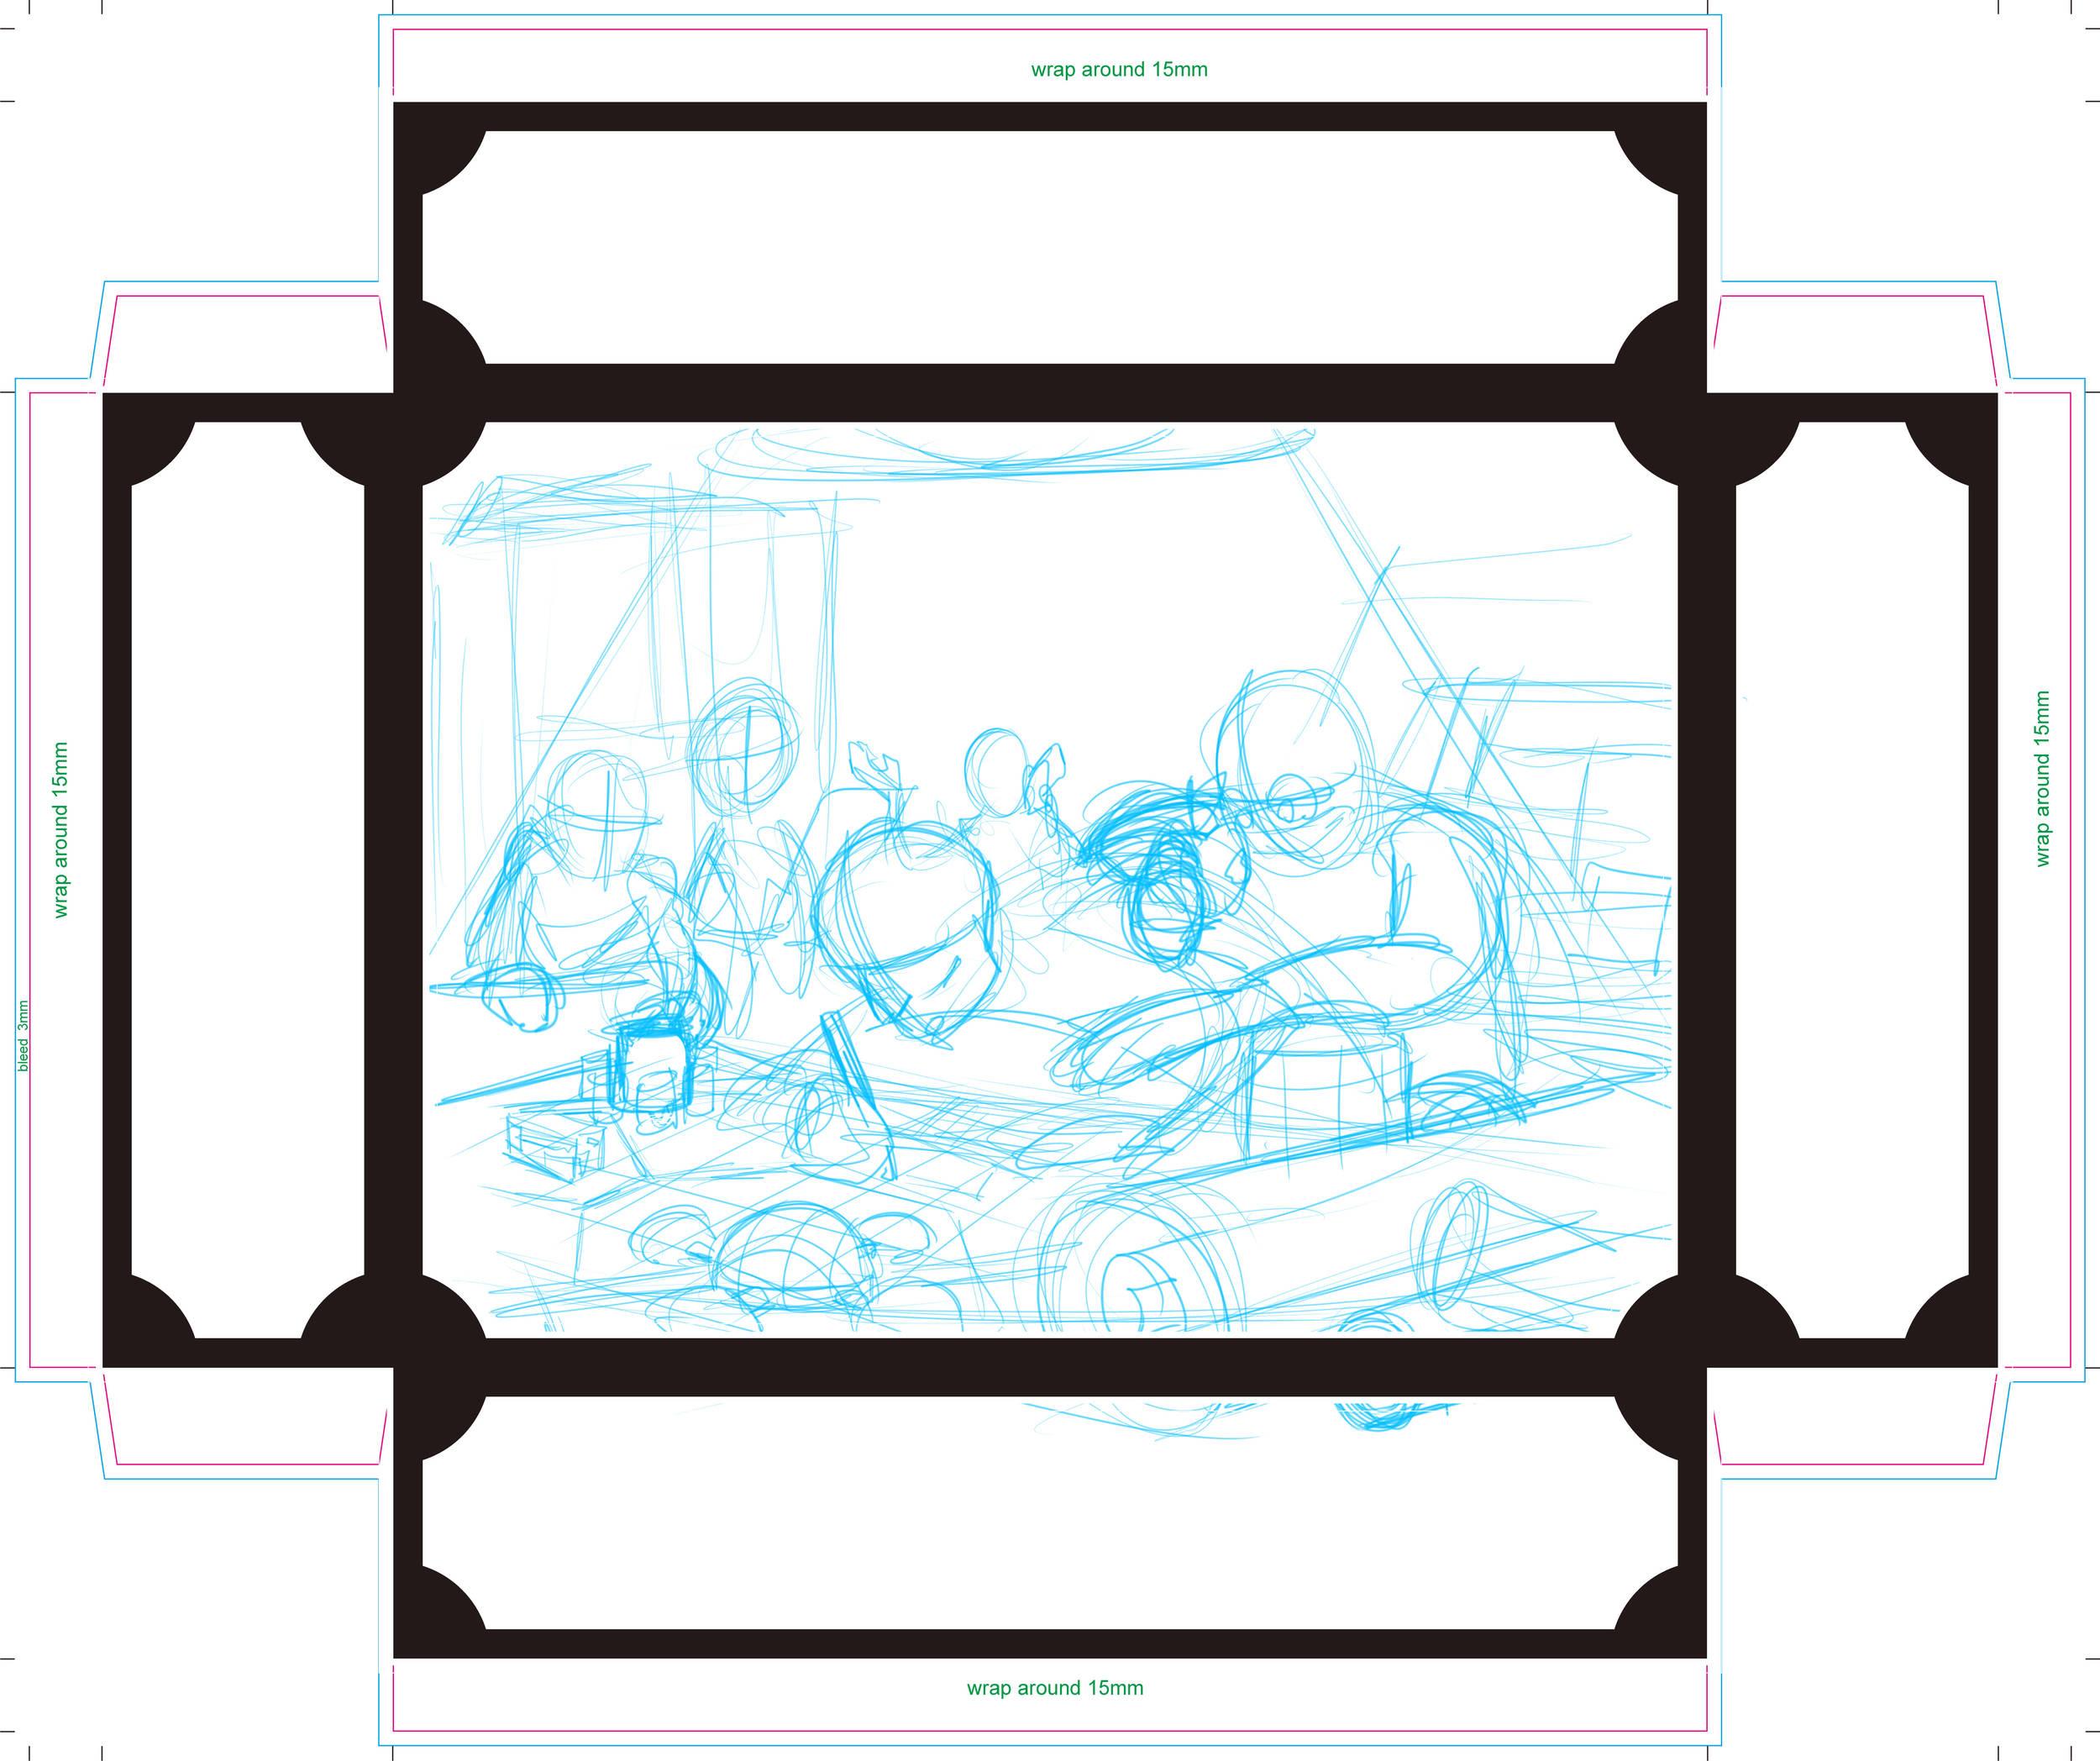 Lunarchitects-Game-Box-Sketch-v2.jpg